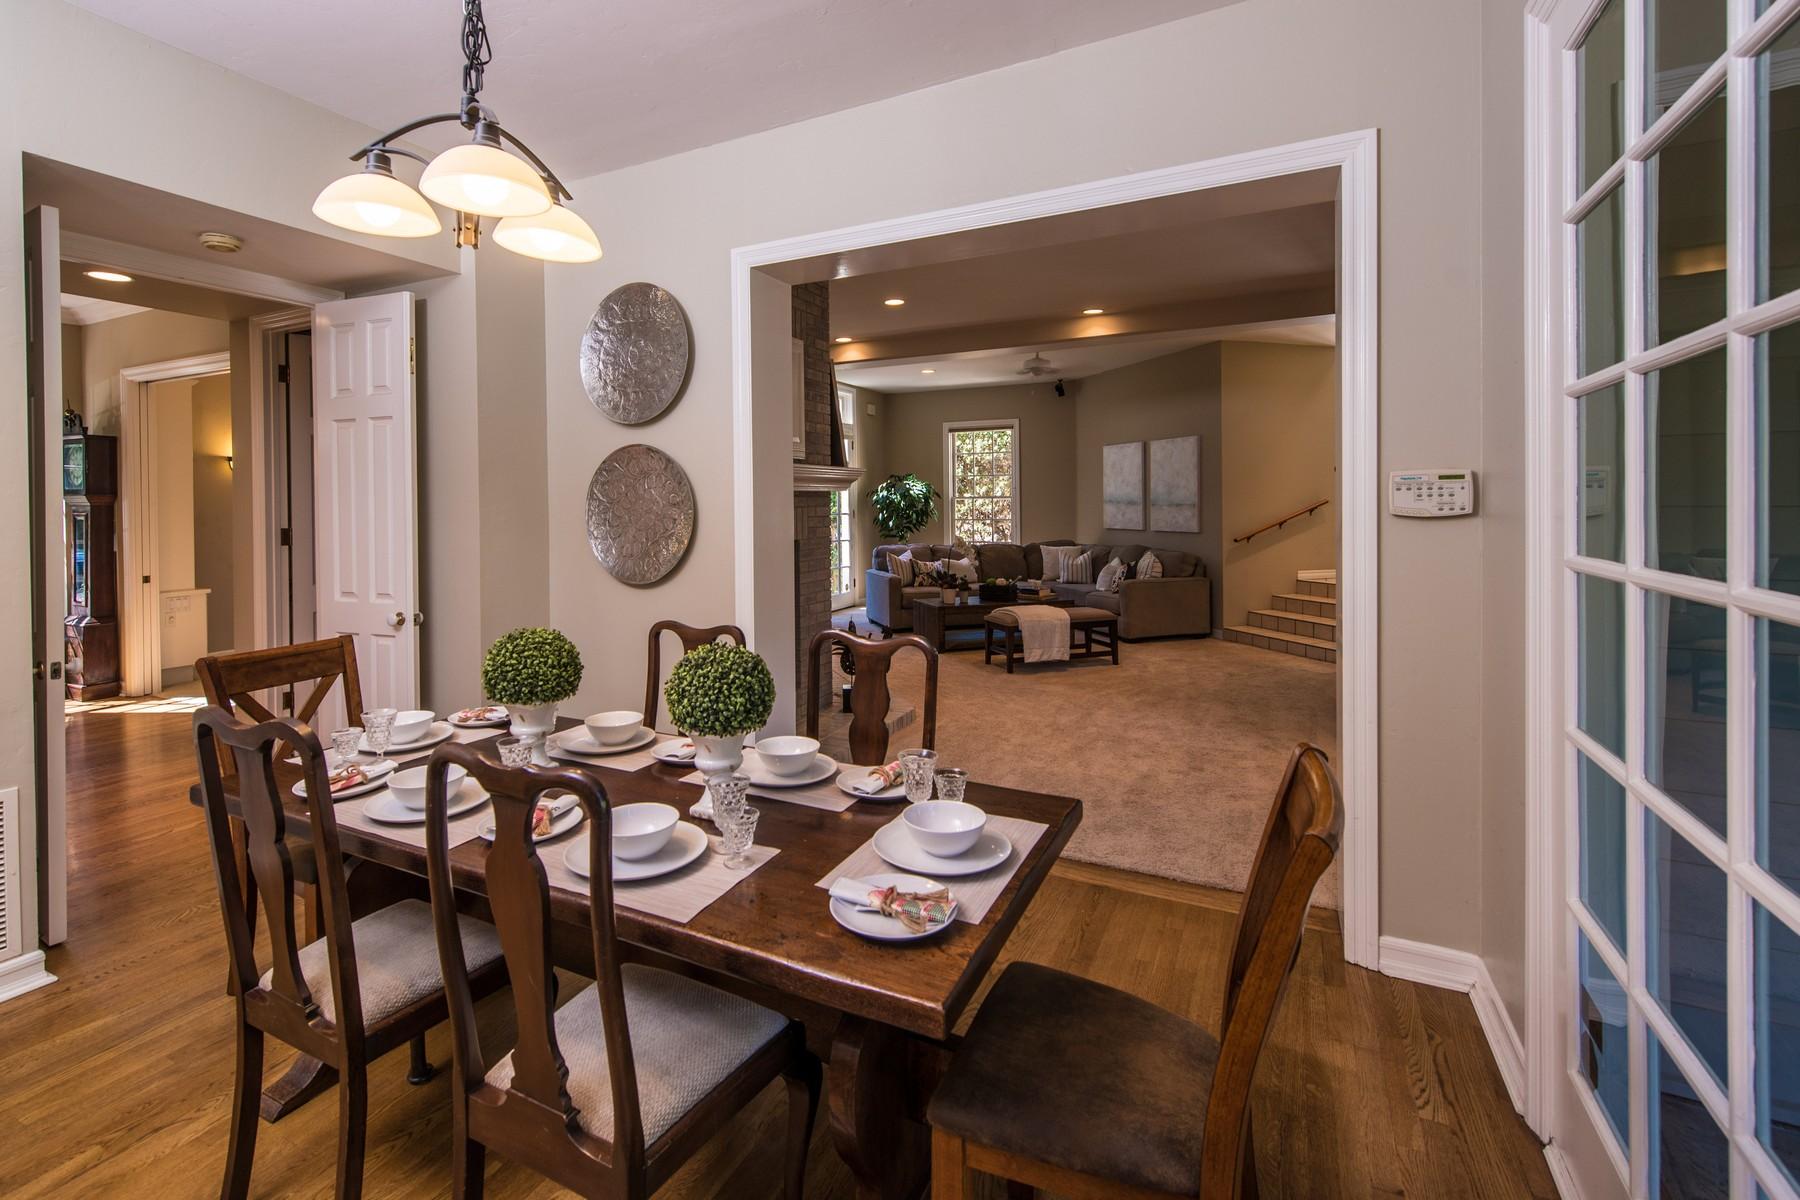 Additional photo for property listing at 4820 Sun Valley Road  Del Mar, Калифорния 92014 Соединенные Штаты